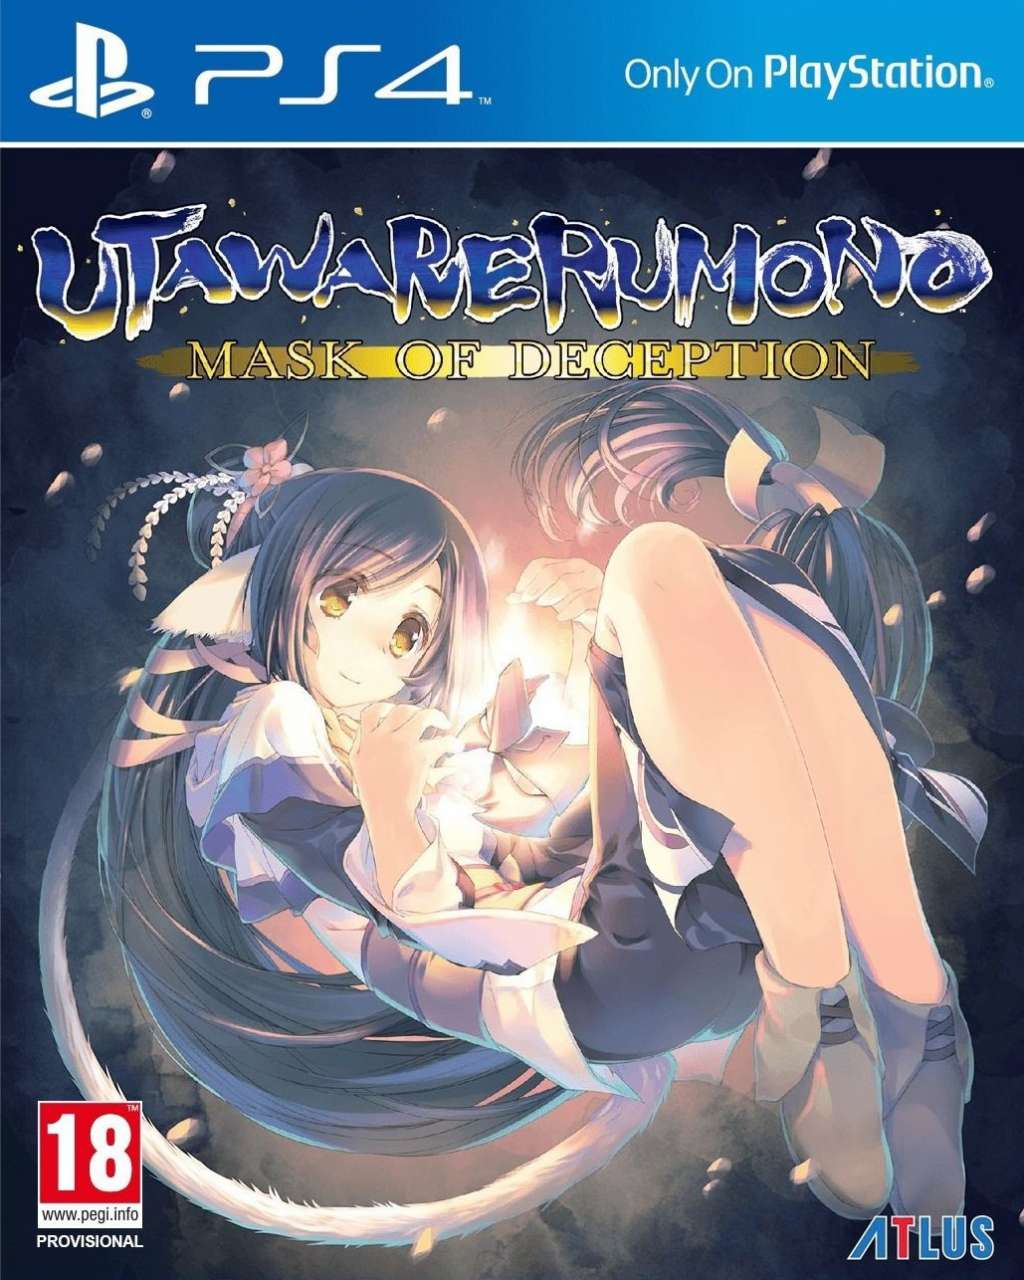 Utawarerumono Mask of Deception PS4 Portada